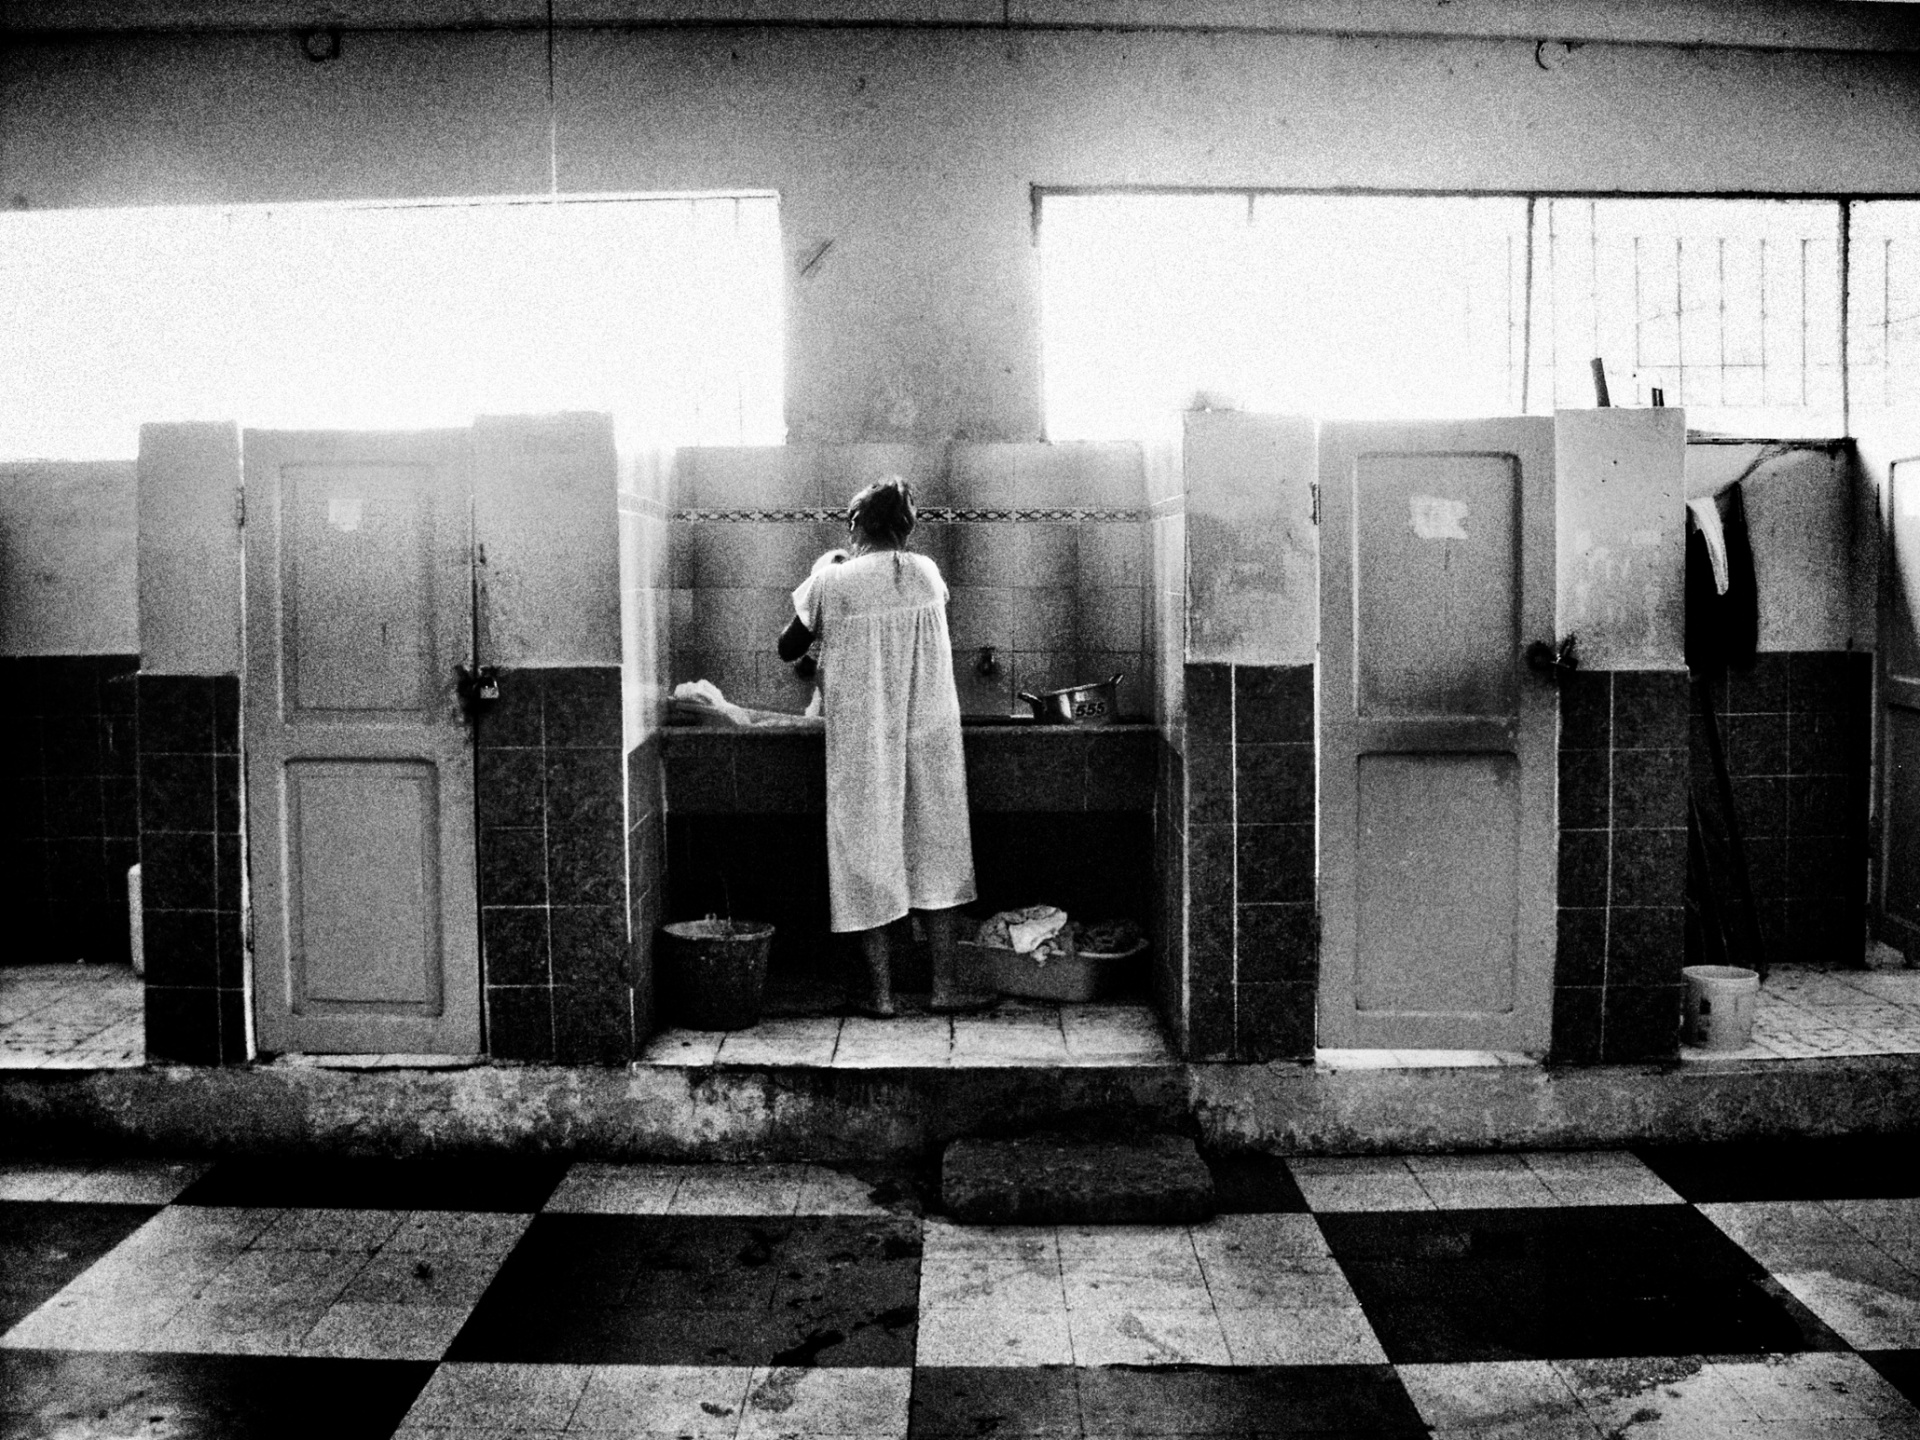 fotograf Valerio Bispuri 4